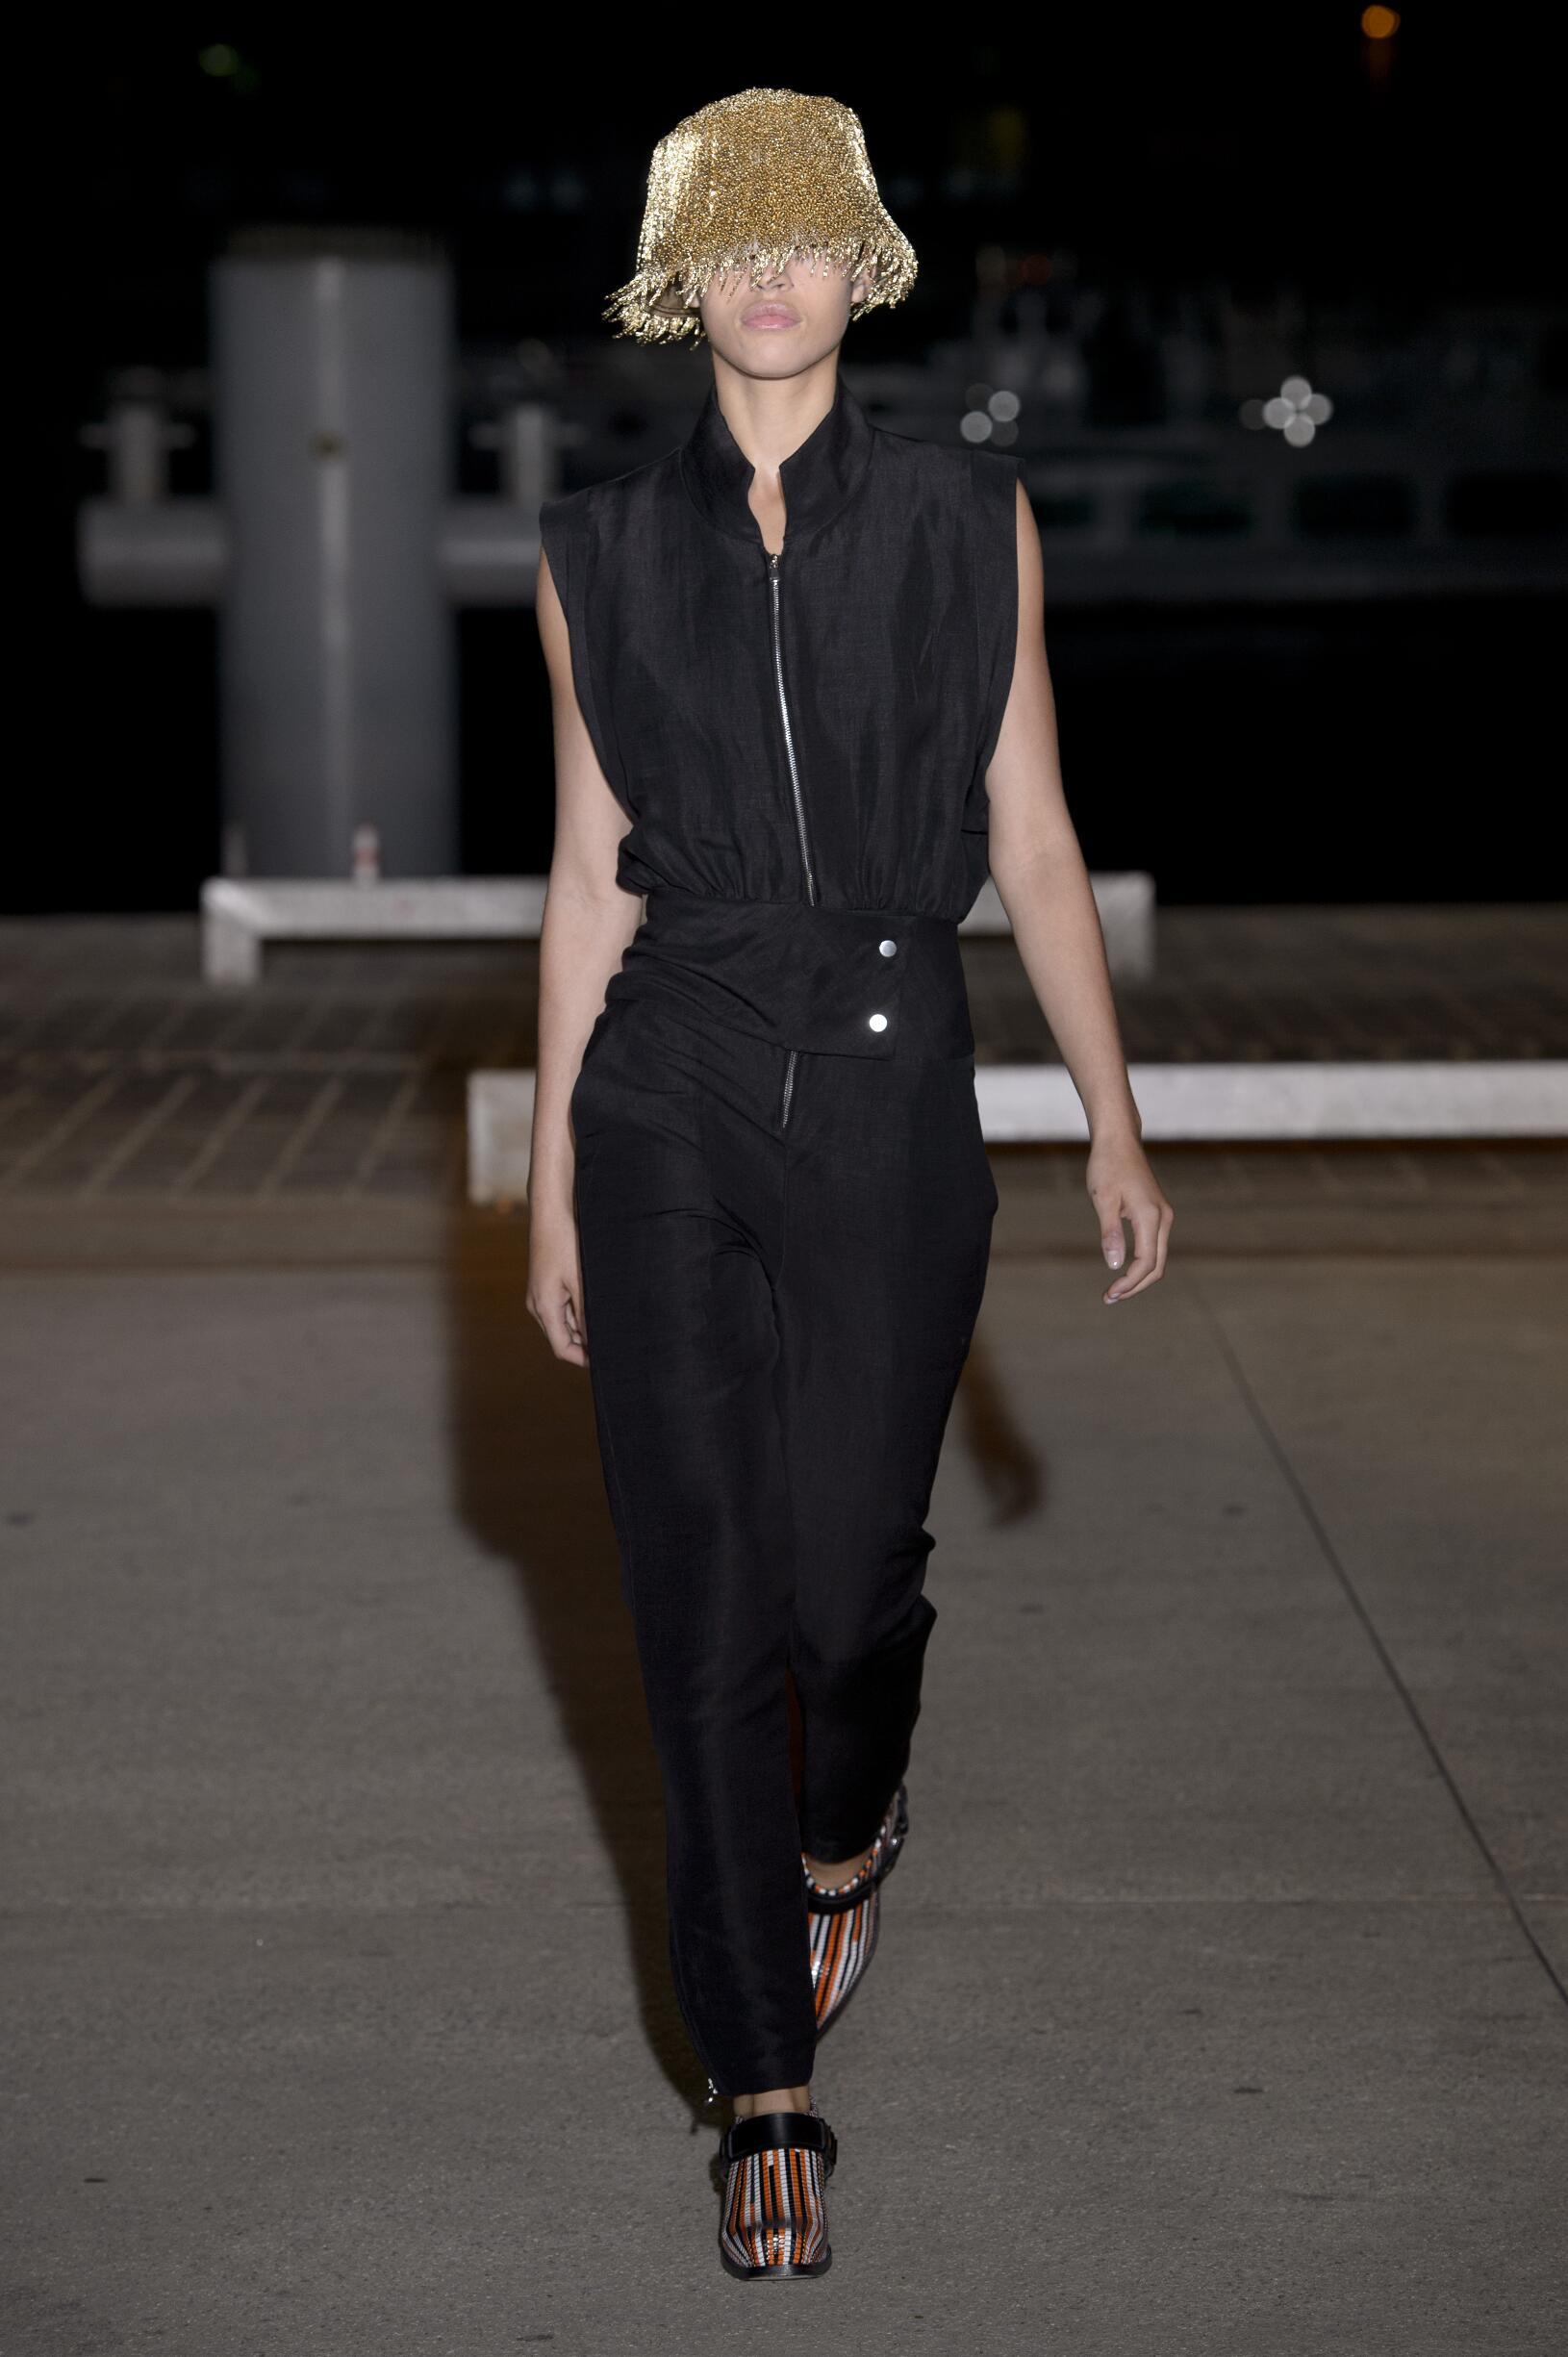 Wanda Nylon Style